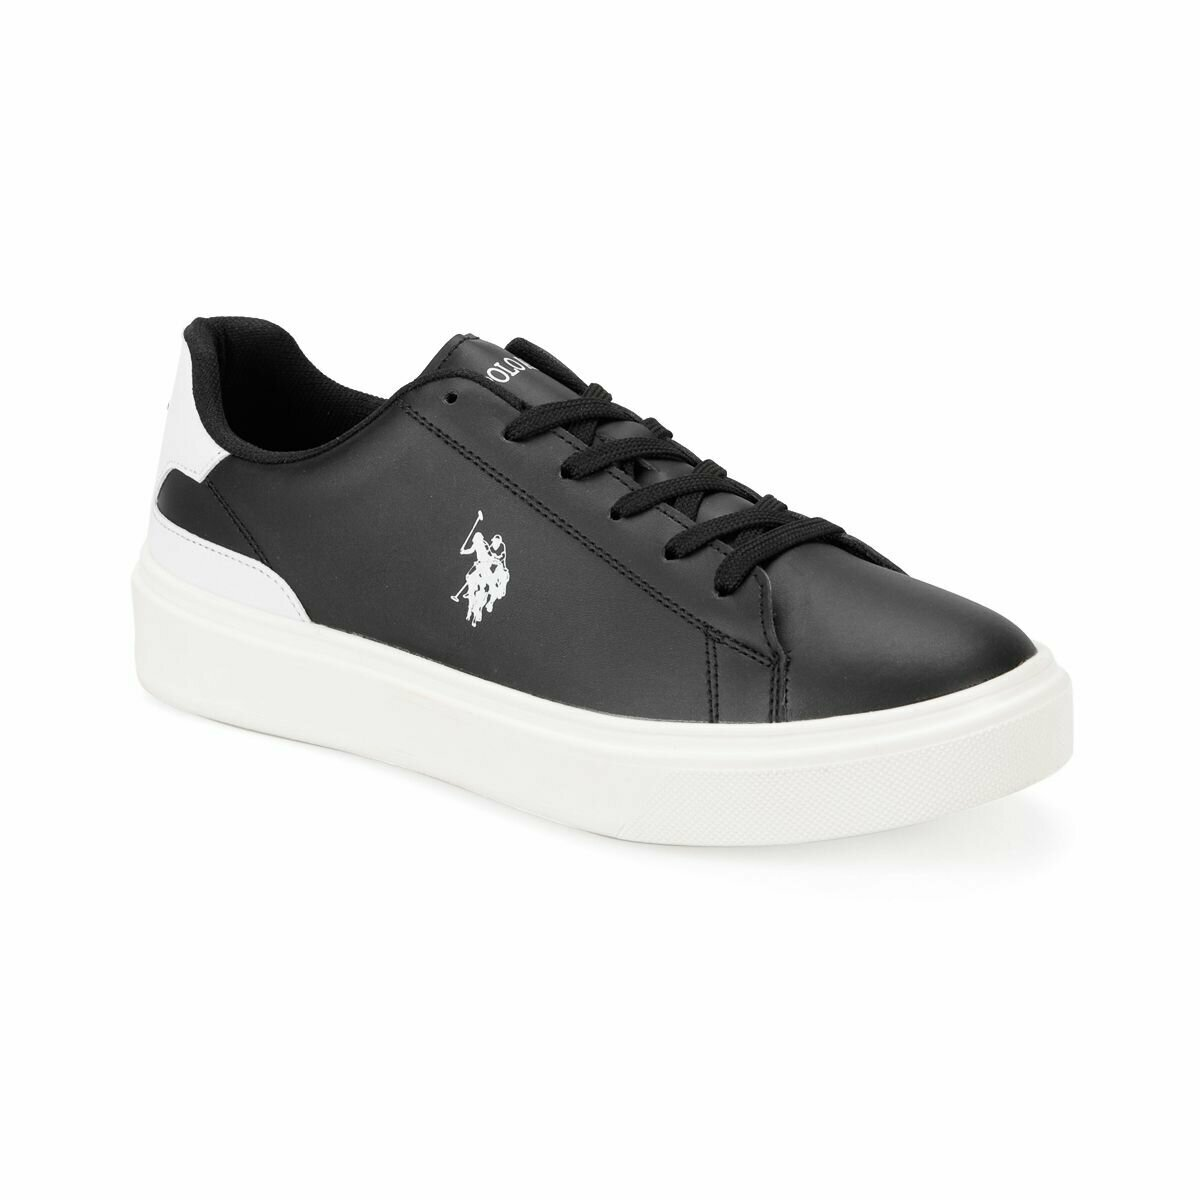 FLO DUKA Black Men 'S Sneaker Shoes U.S. POLO ASSN.